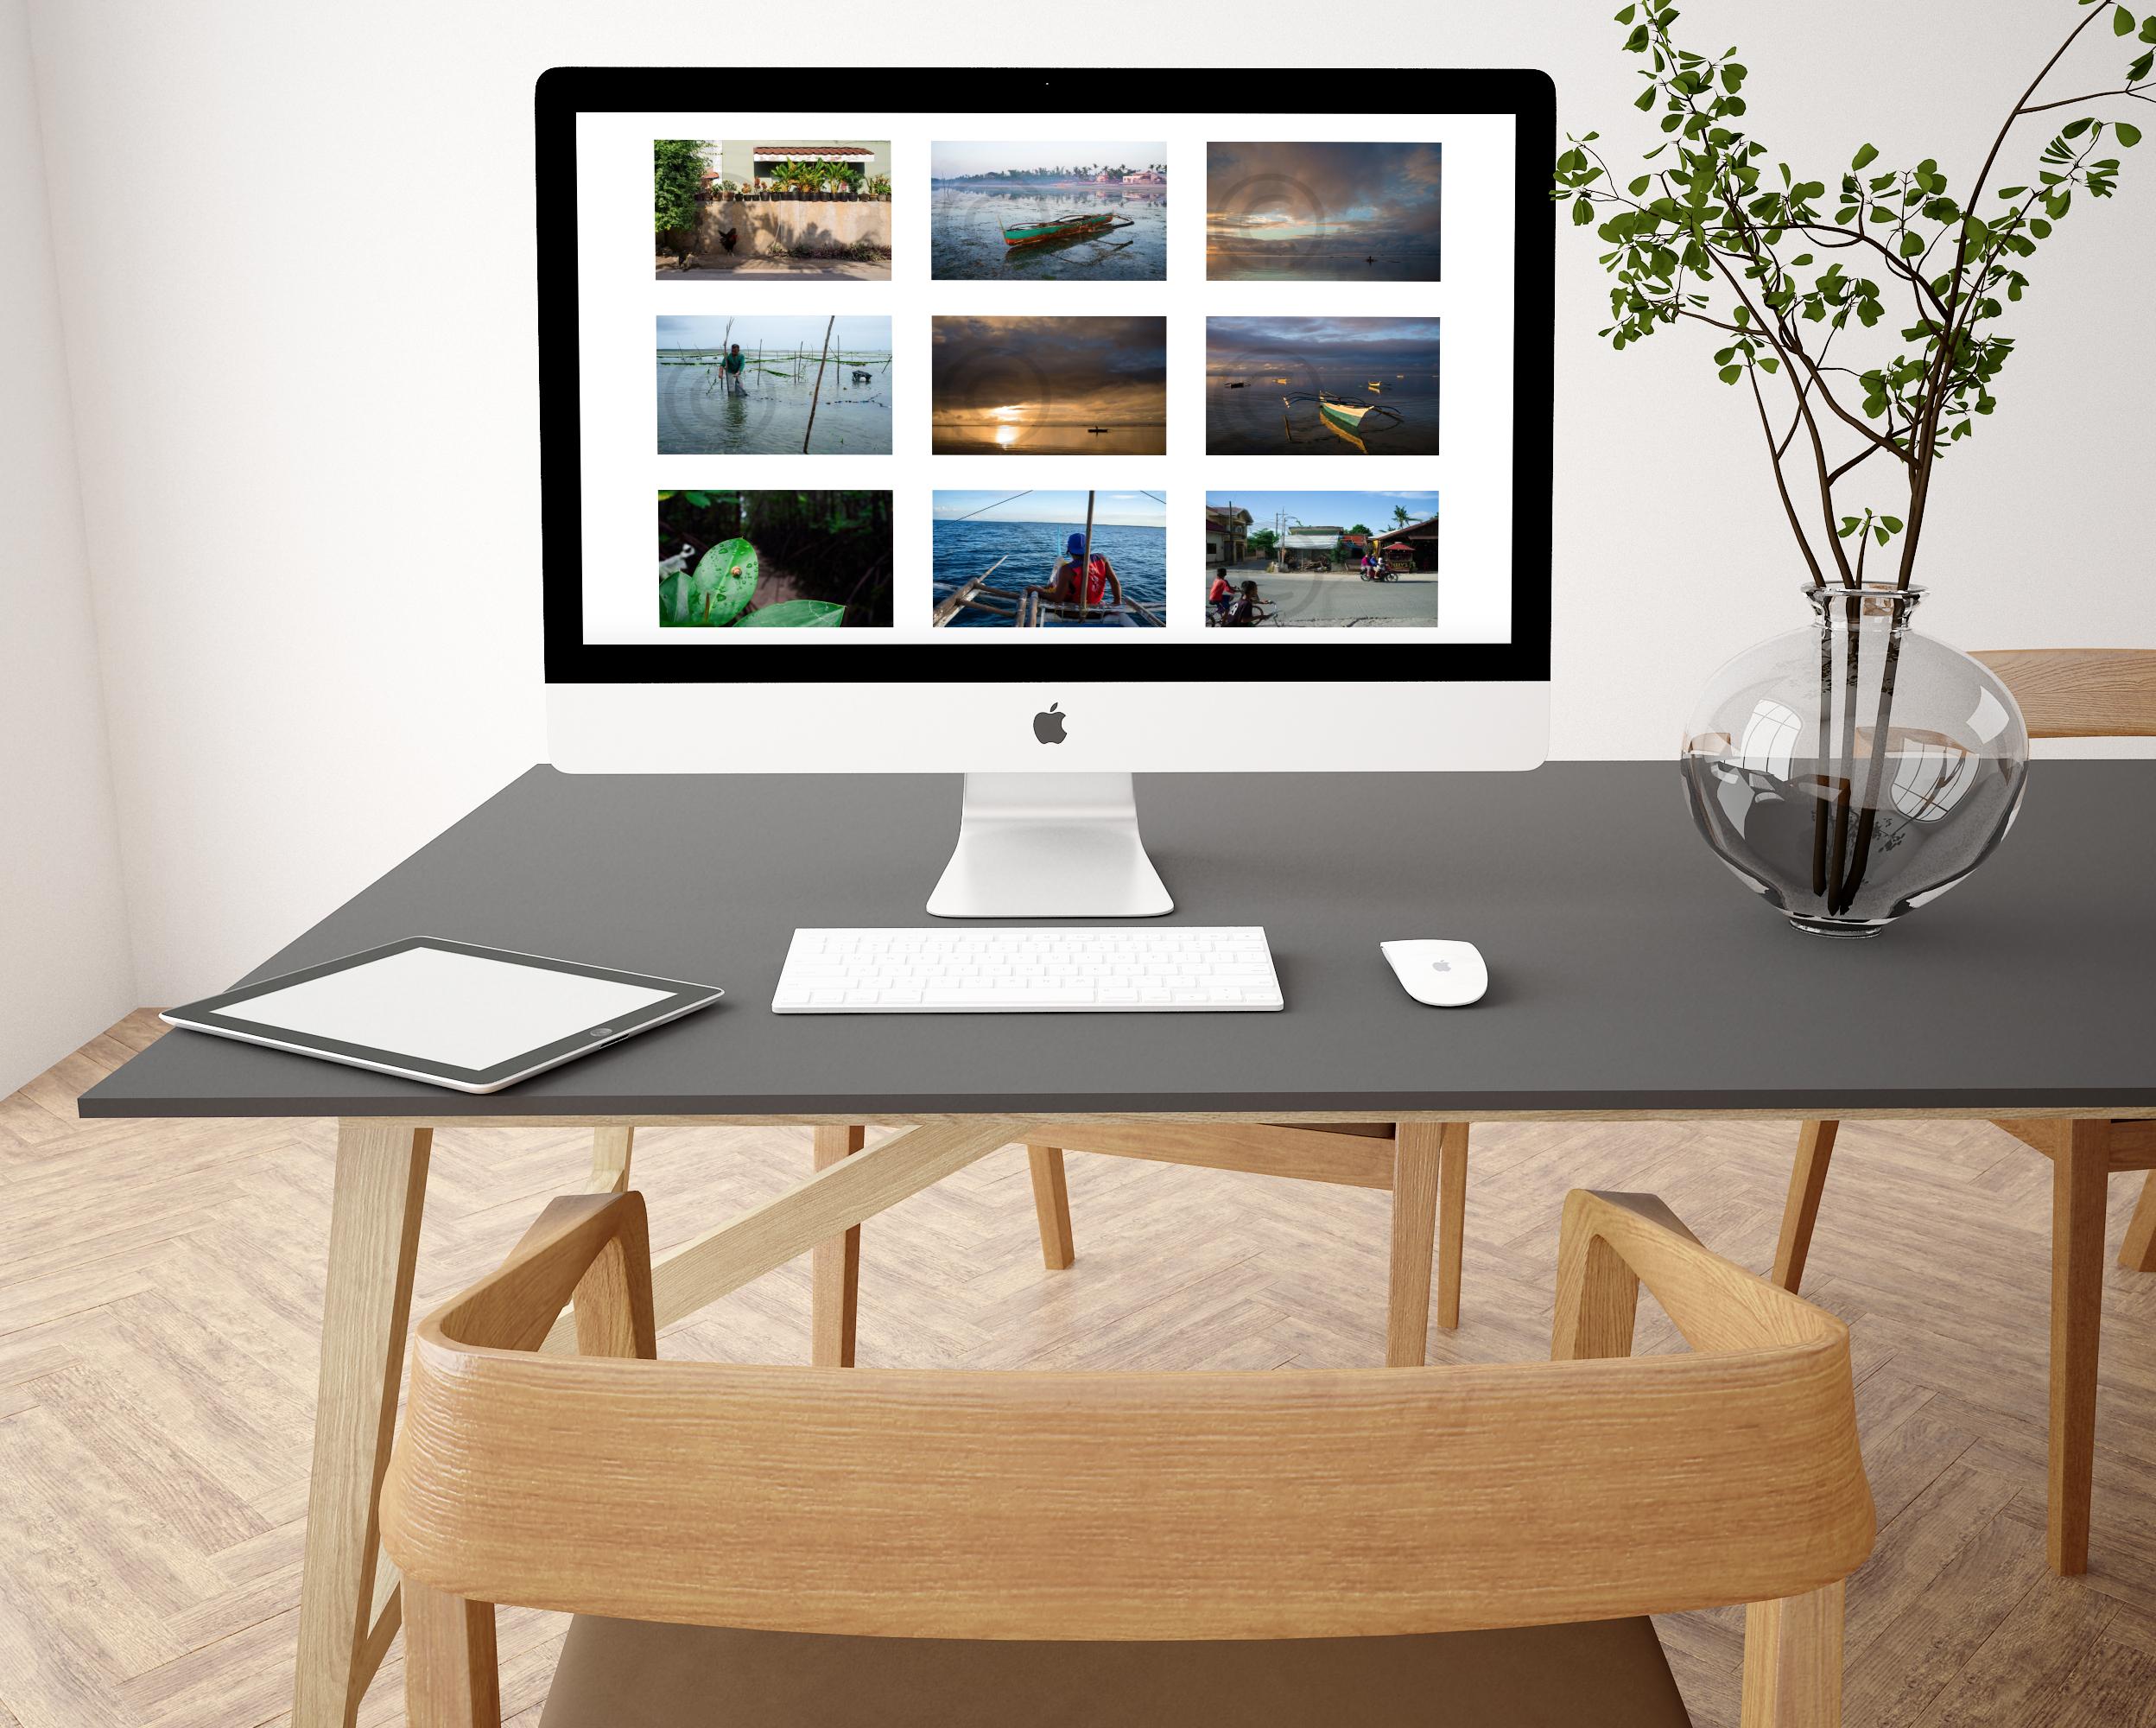 retro-events-marketing-photographer-website-design-sell-photos-online-webdesigner.jpg